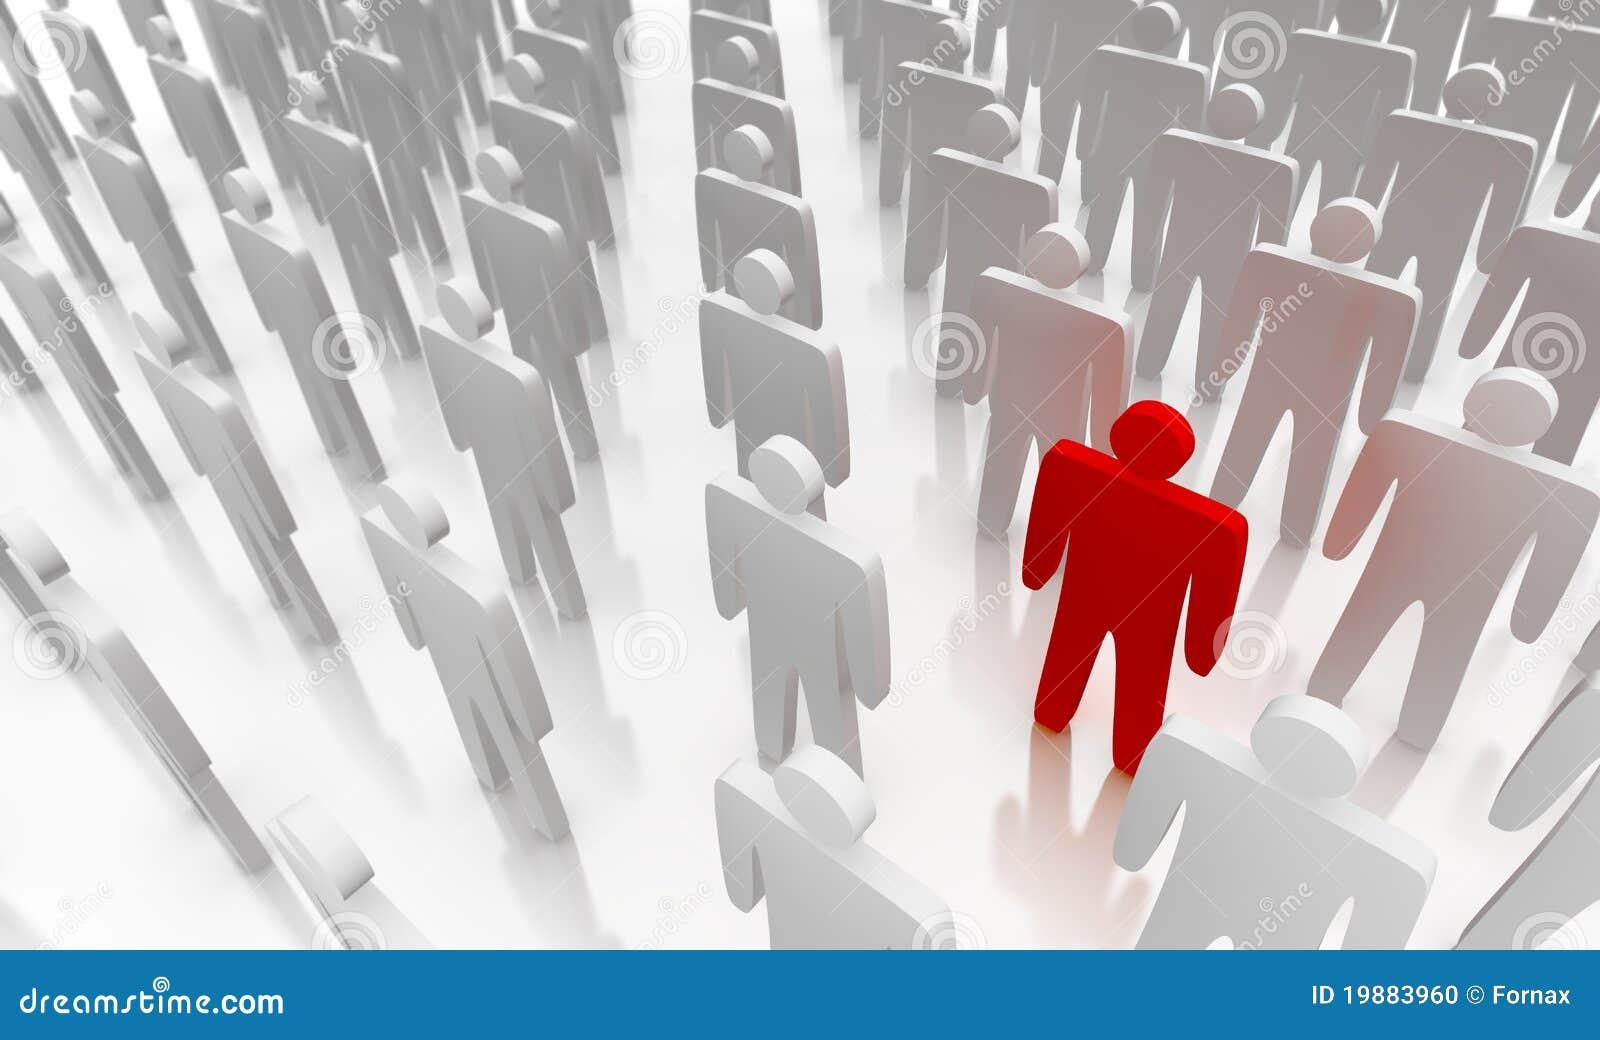 Individuality Concept Stock Photo Image 19883960